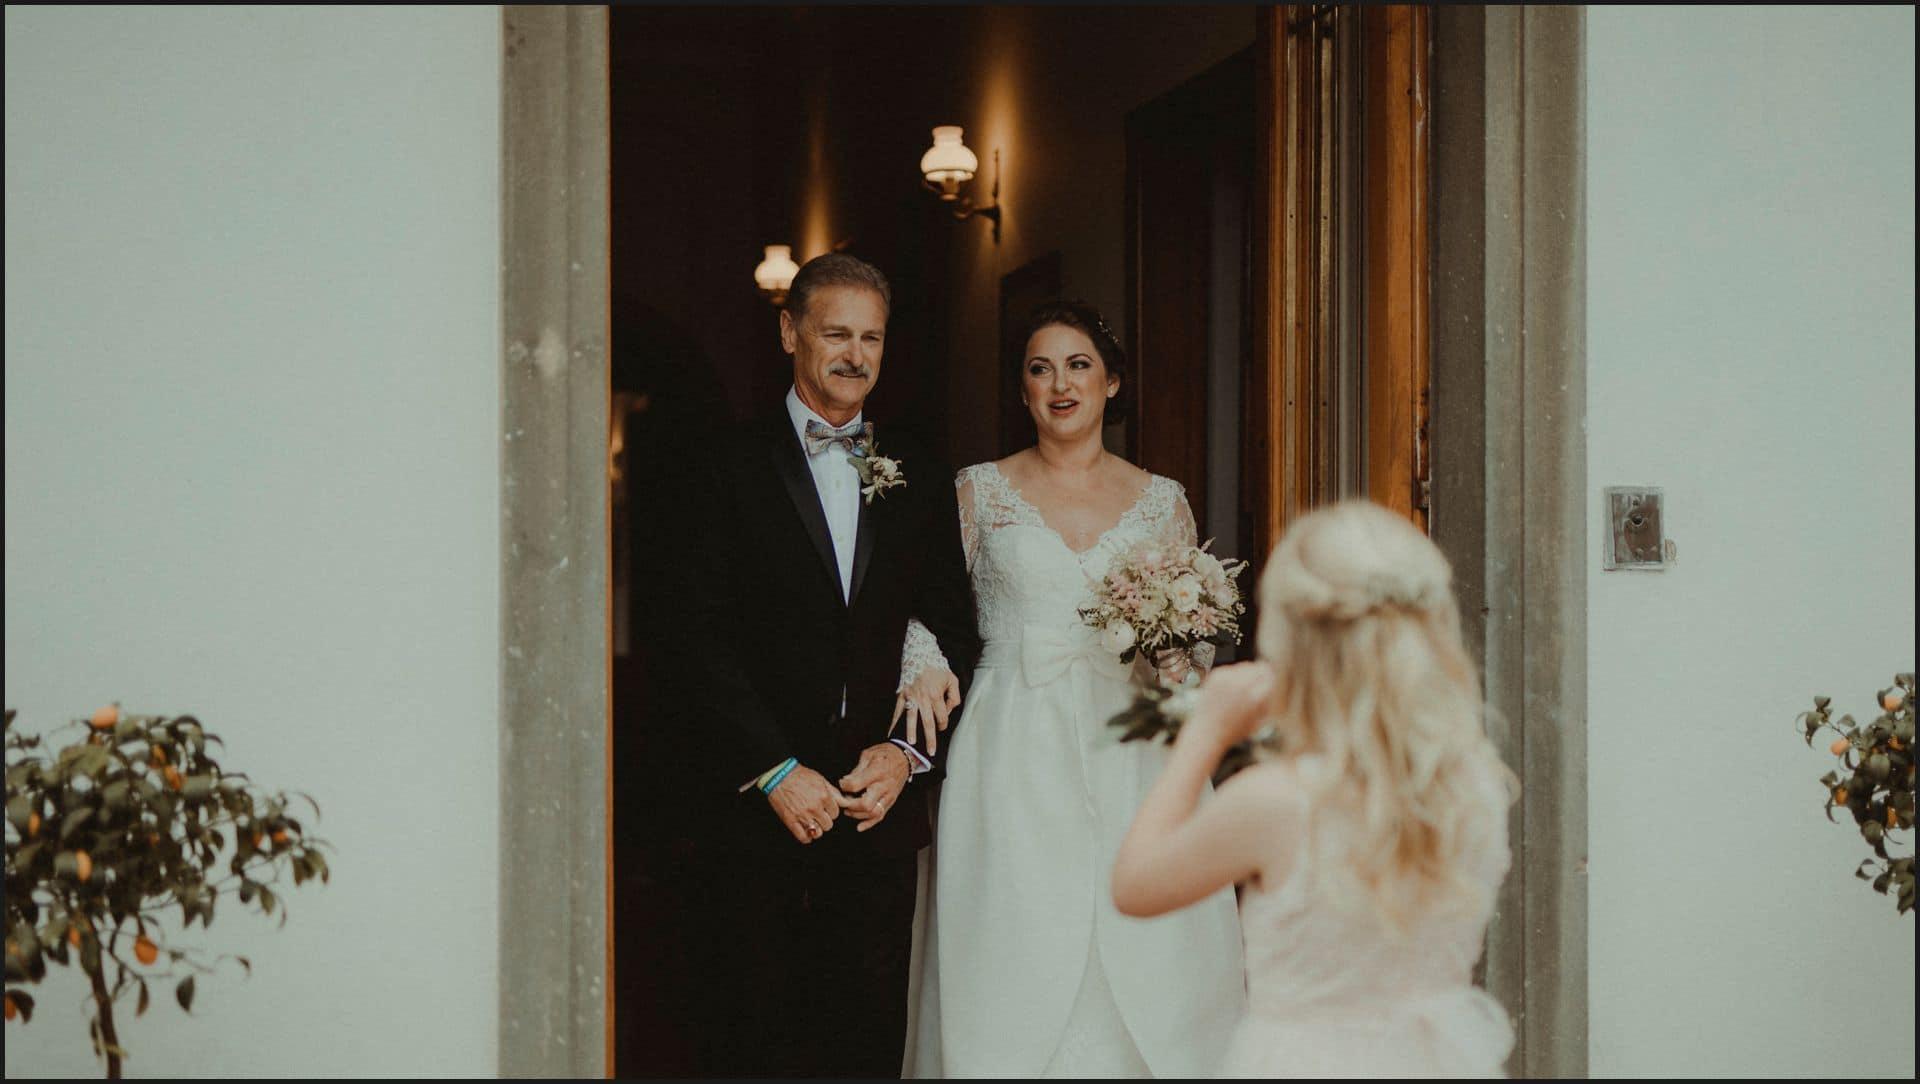 tuscany, destination wedding, chianti, bride, father of the bride, ceremony